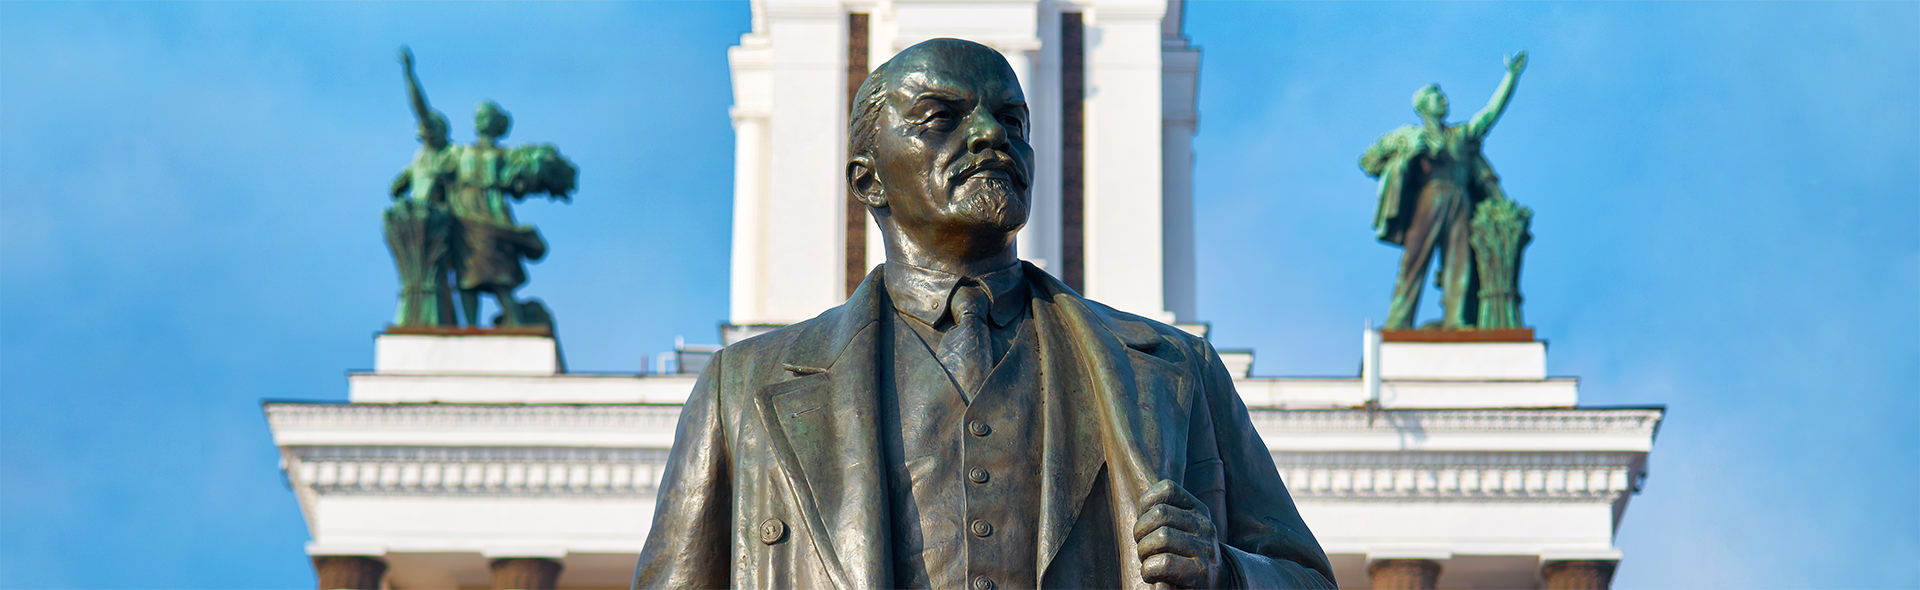 Vladimir Lenin Satue